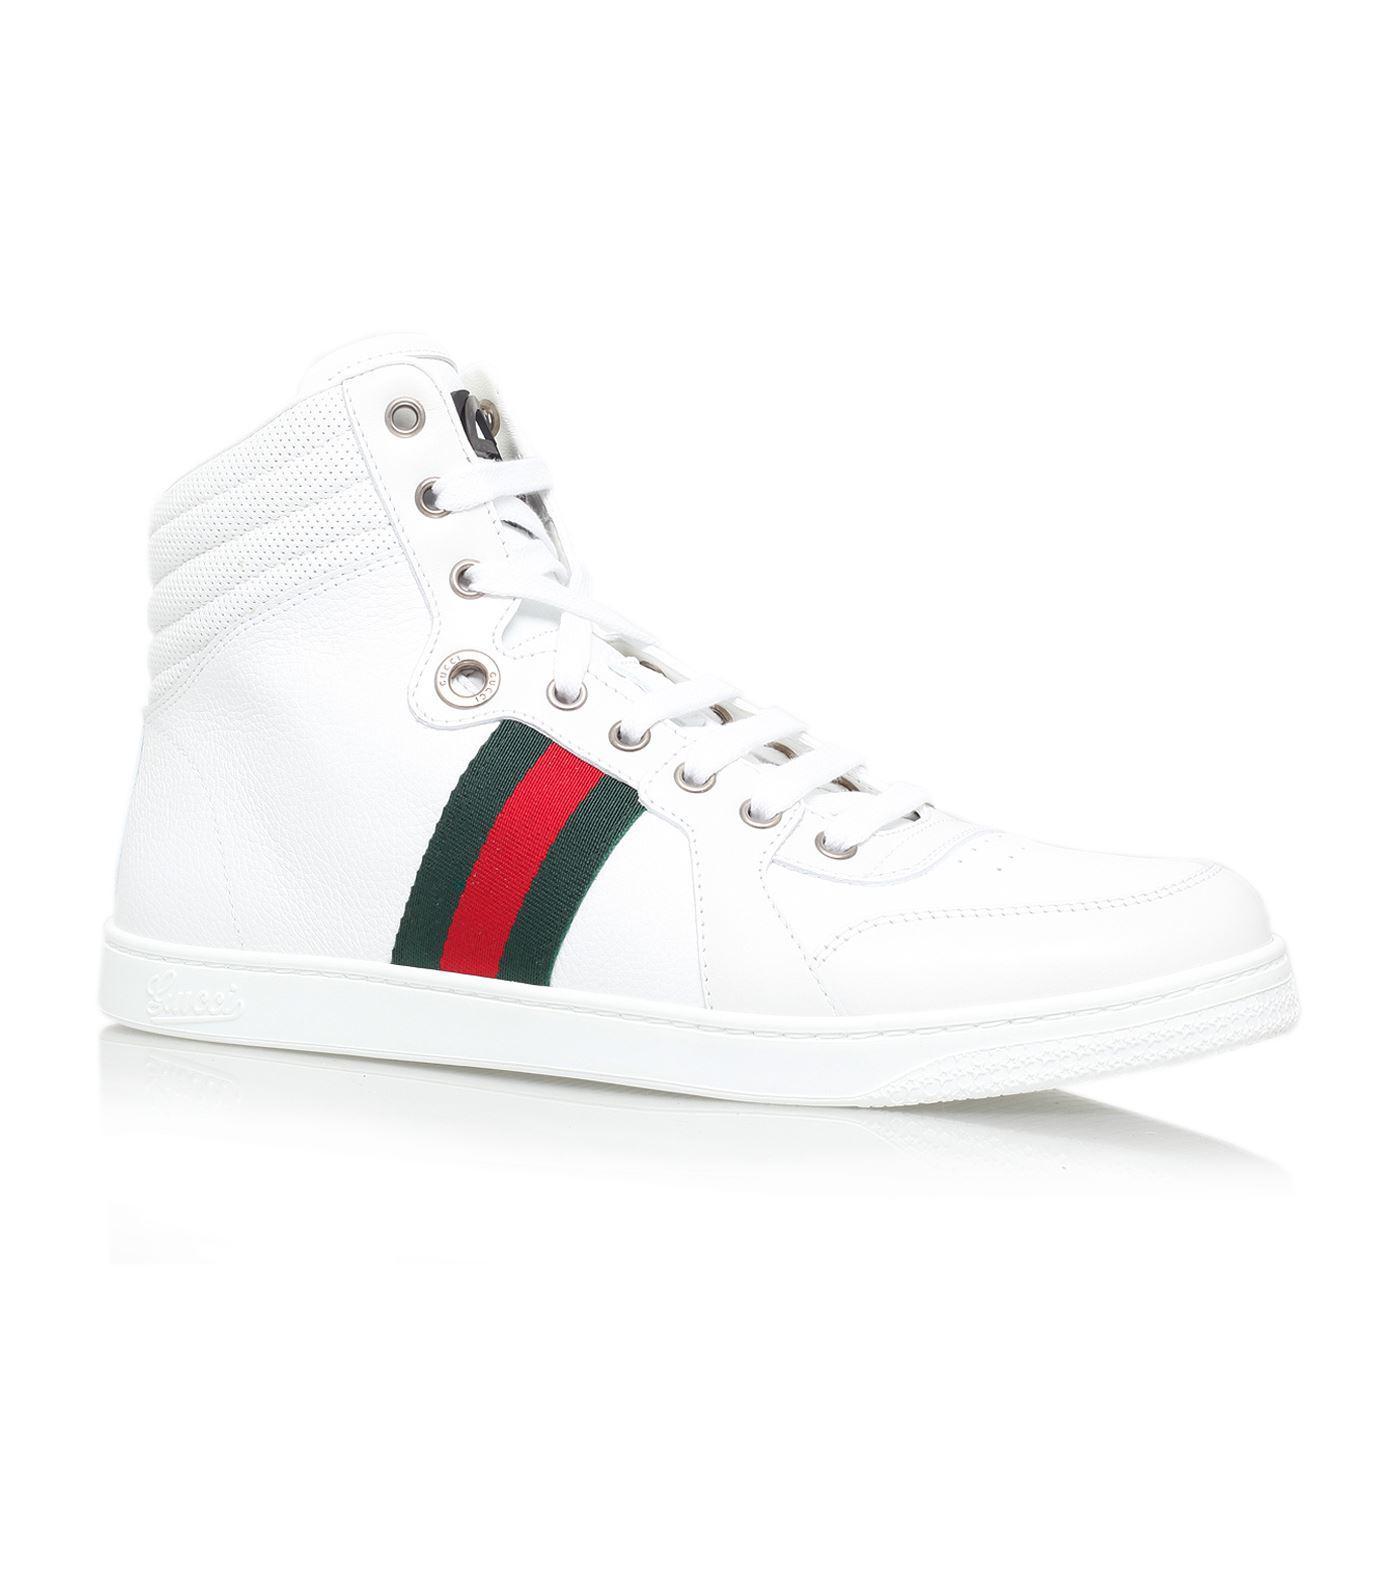 c2b1203b4b66 Lyst - Gucci Coda High-top Sneaker in White for Men